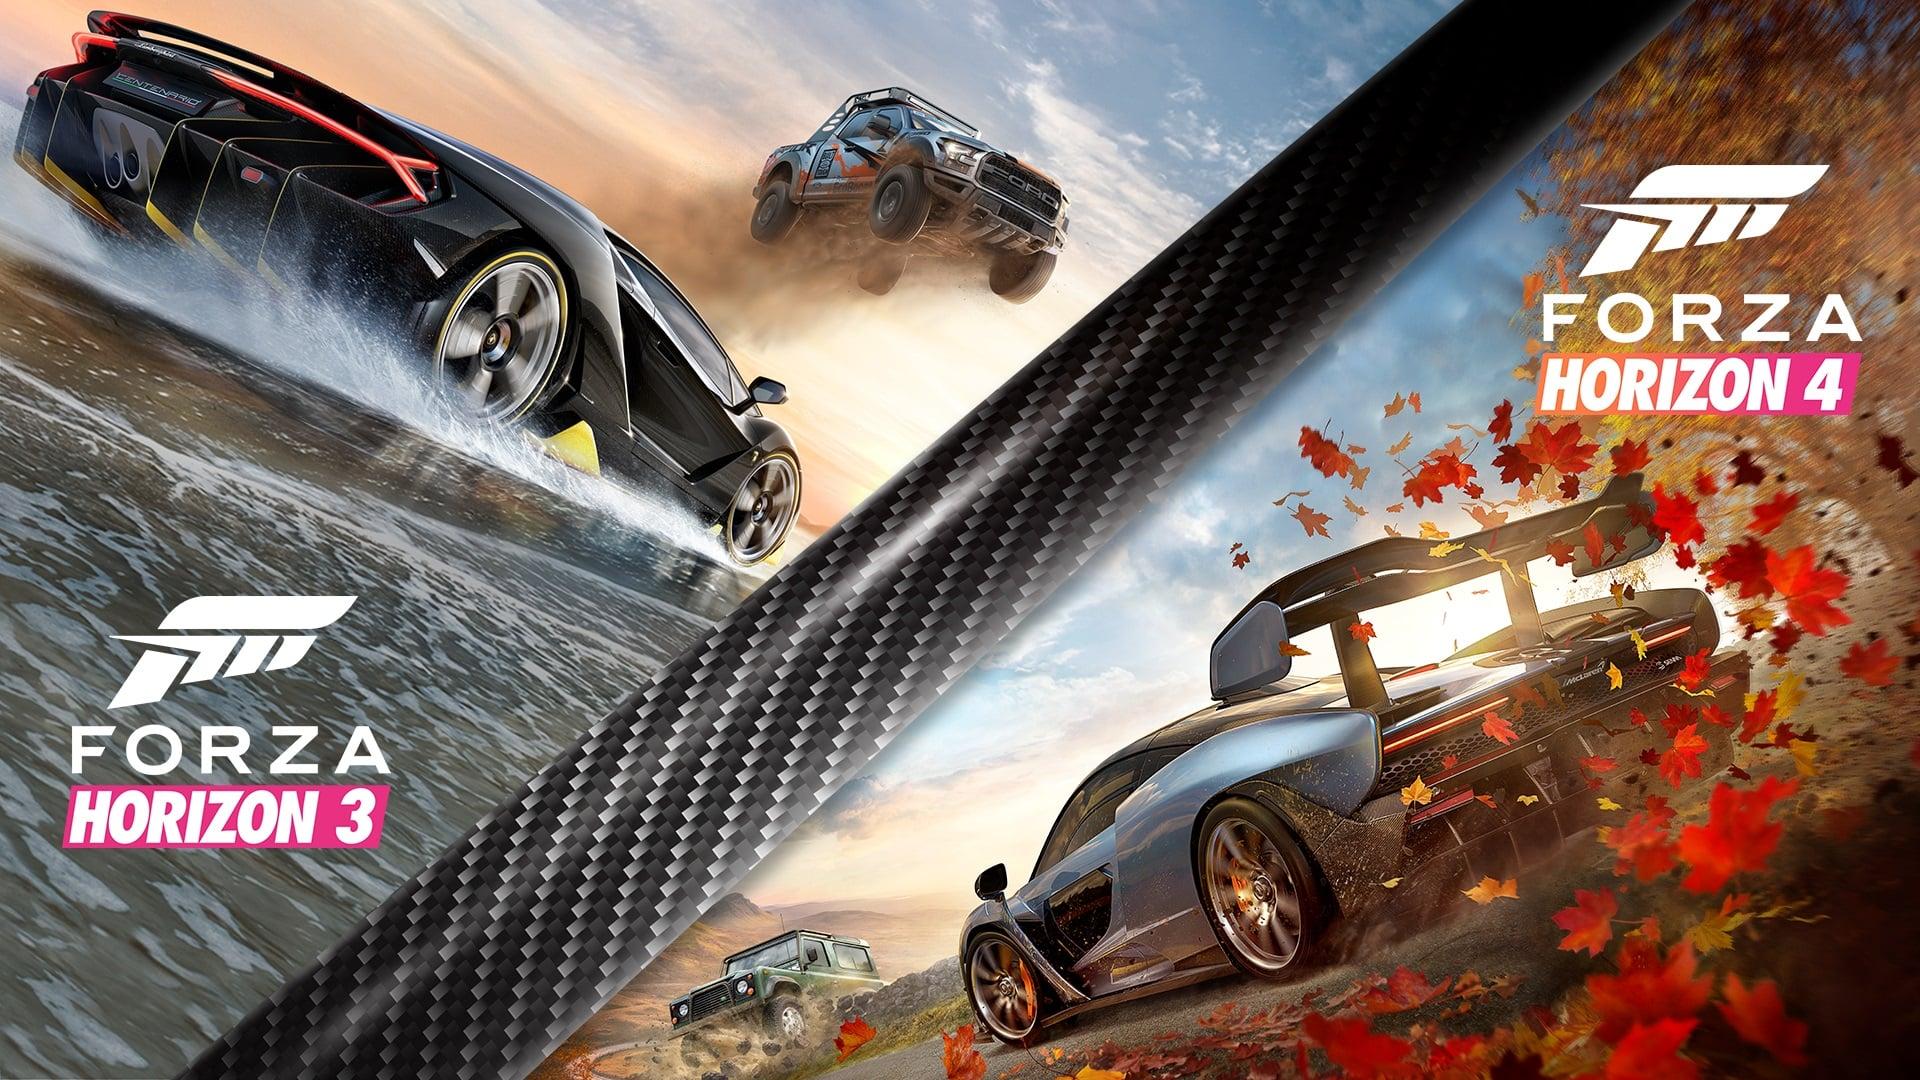 Forza Horizon 4 and Forza Horizon 3 Bundle Releasing 5th